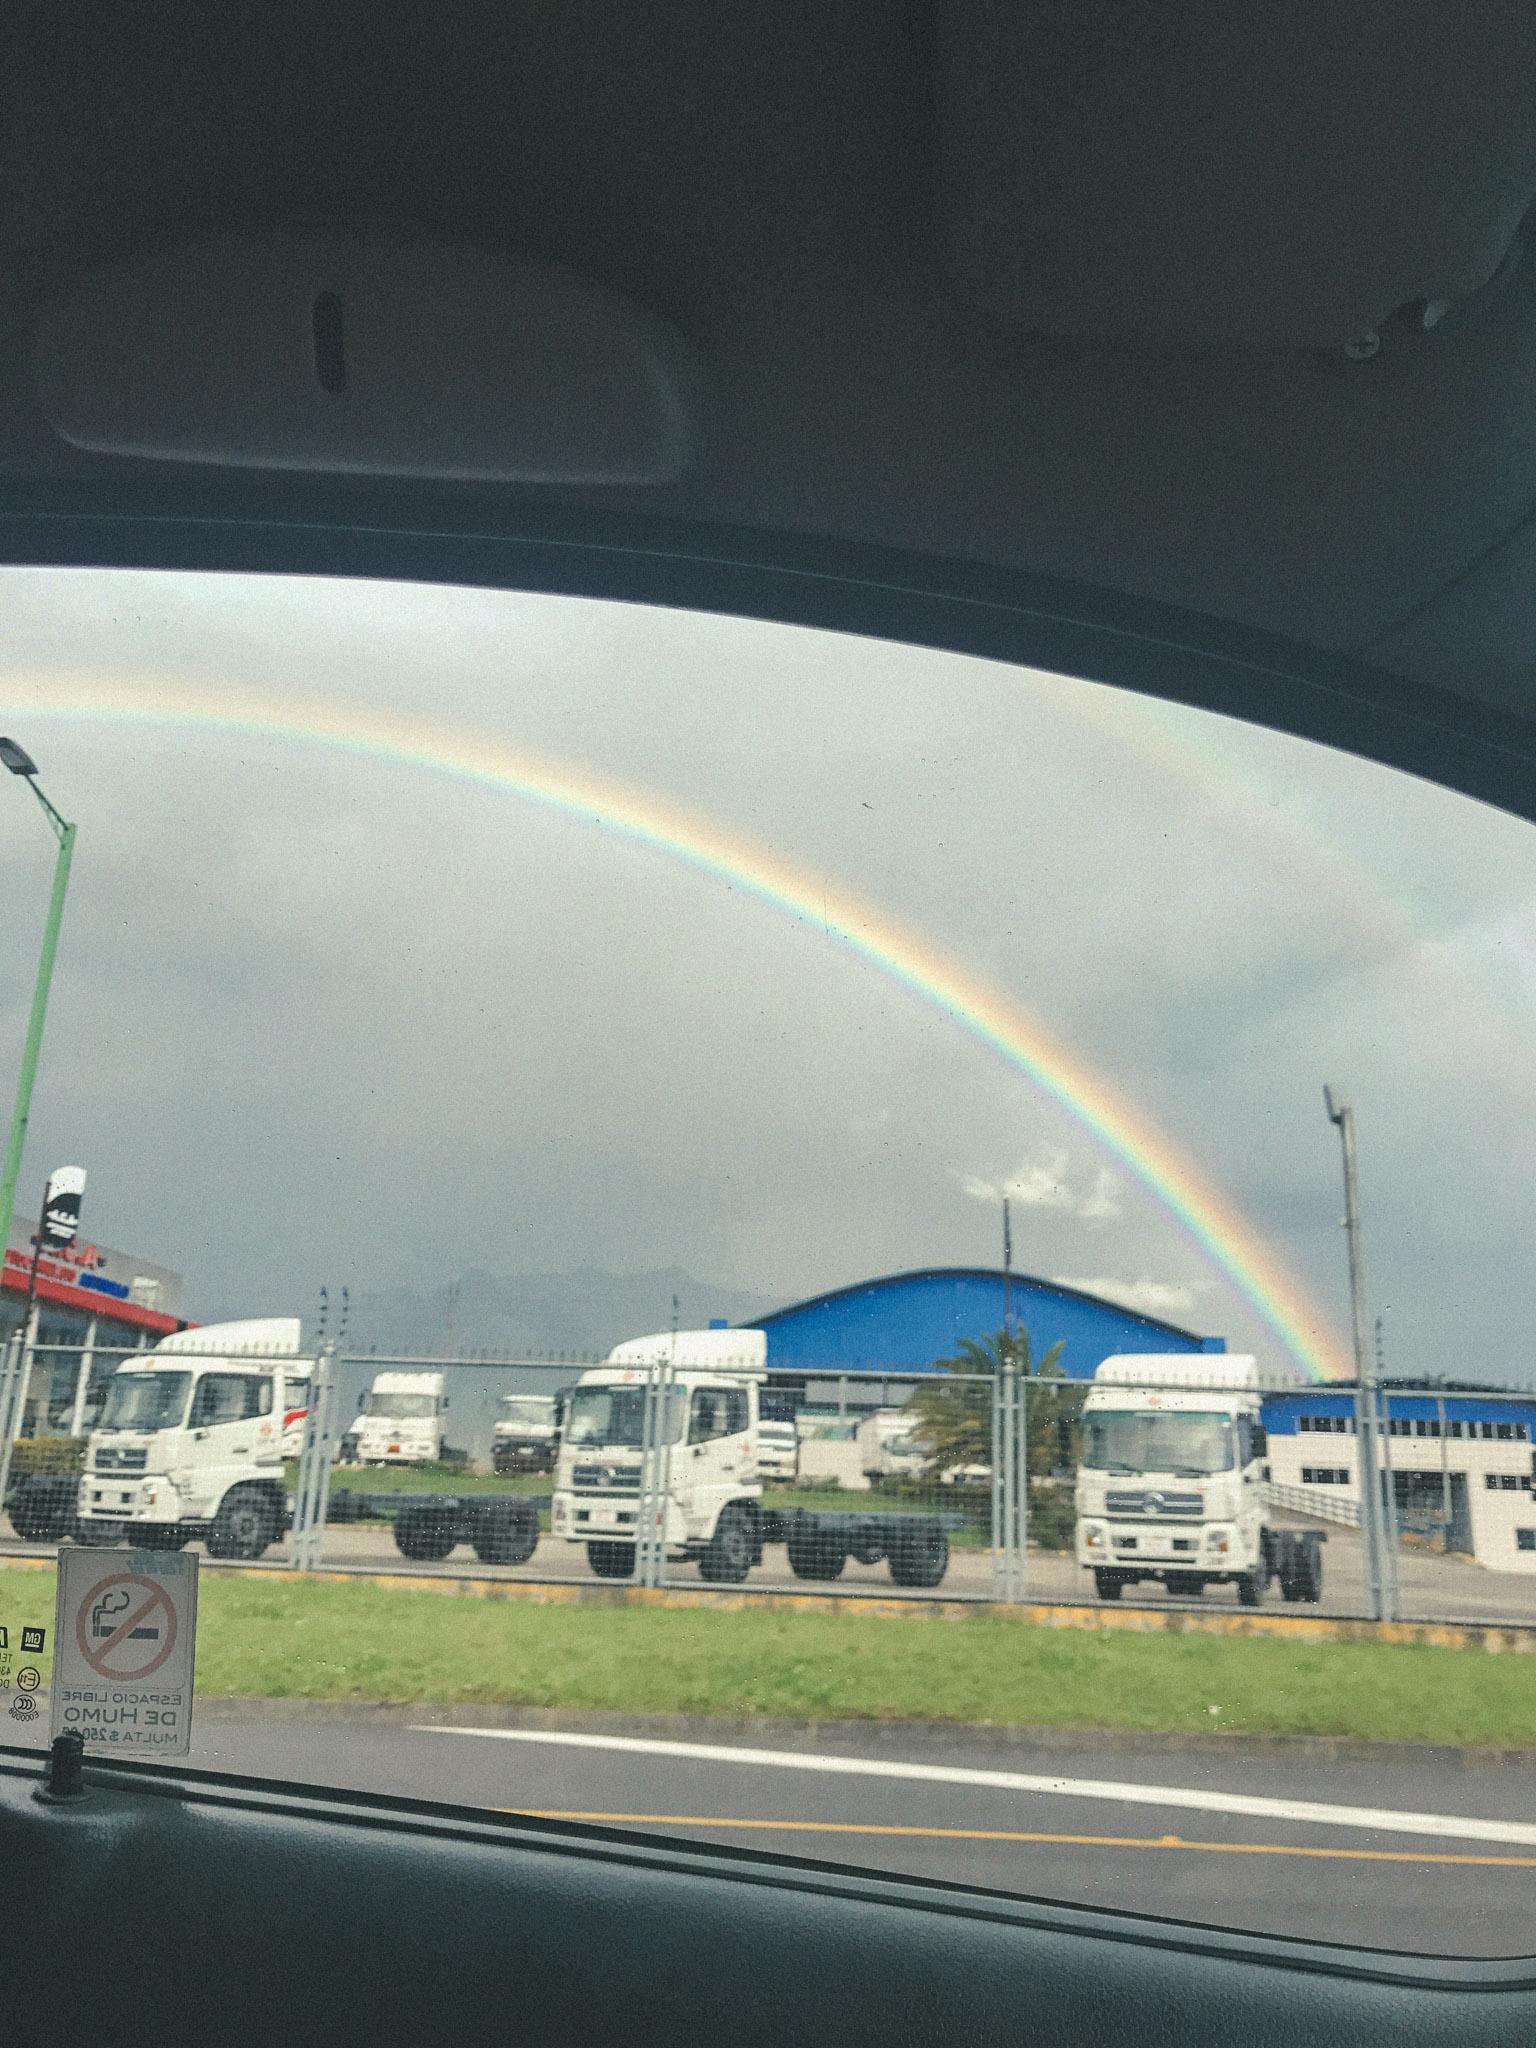 ChilcabambaLodge_Ecuador_PerriRothenberg-1.jpg